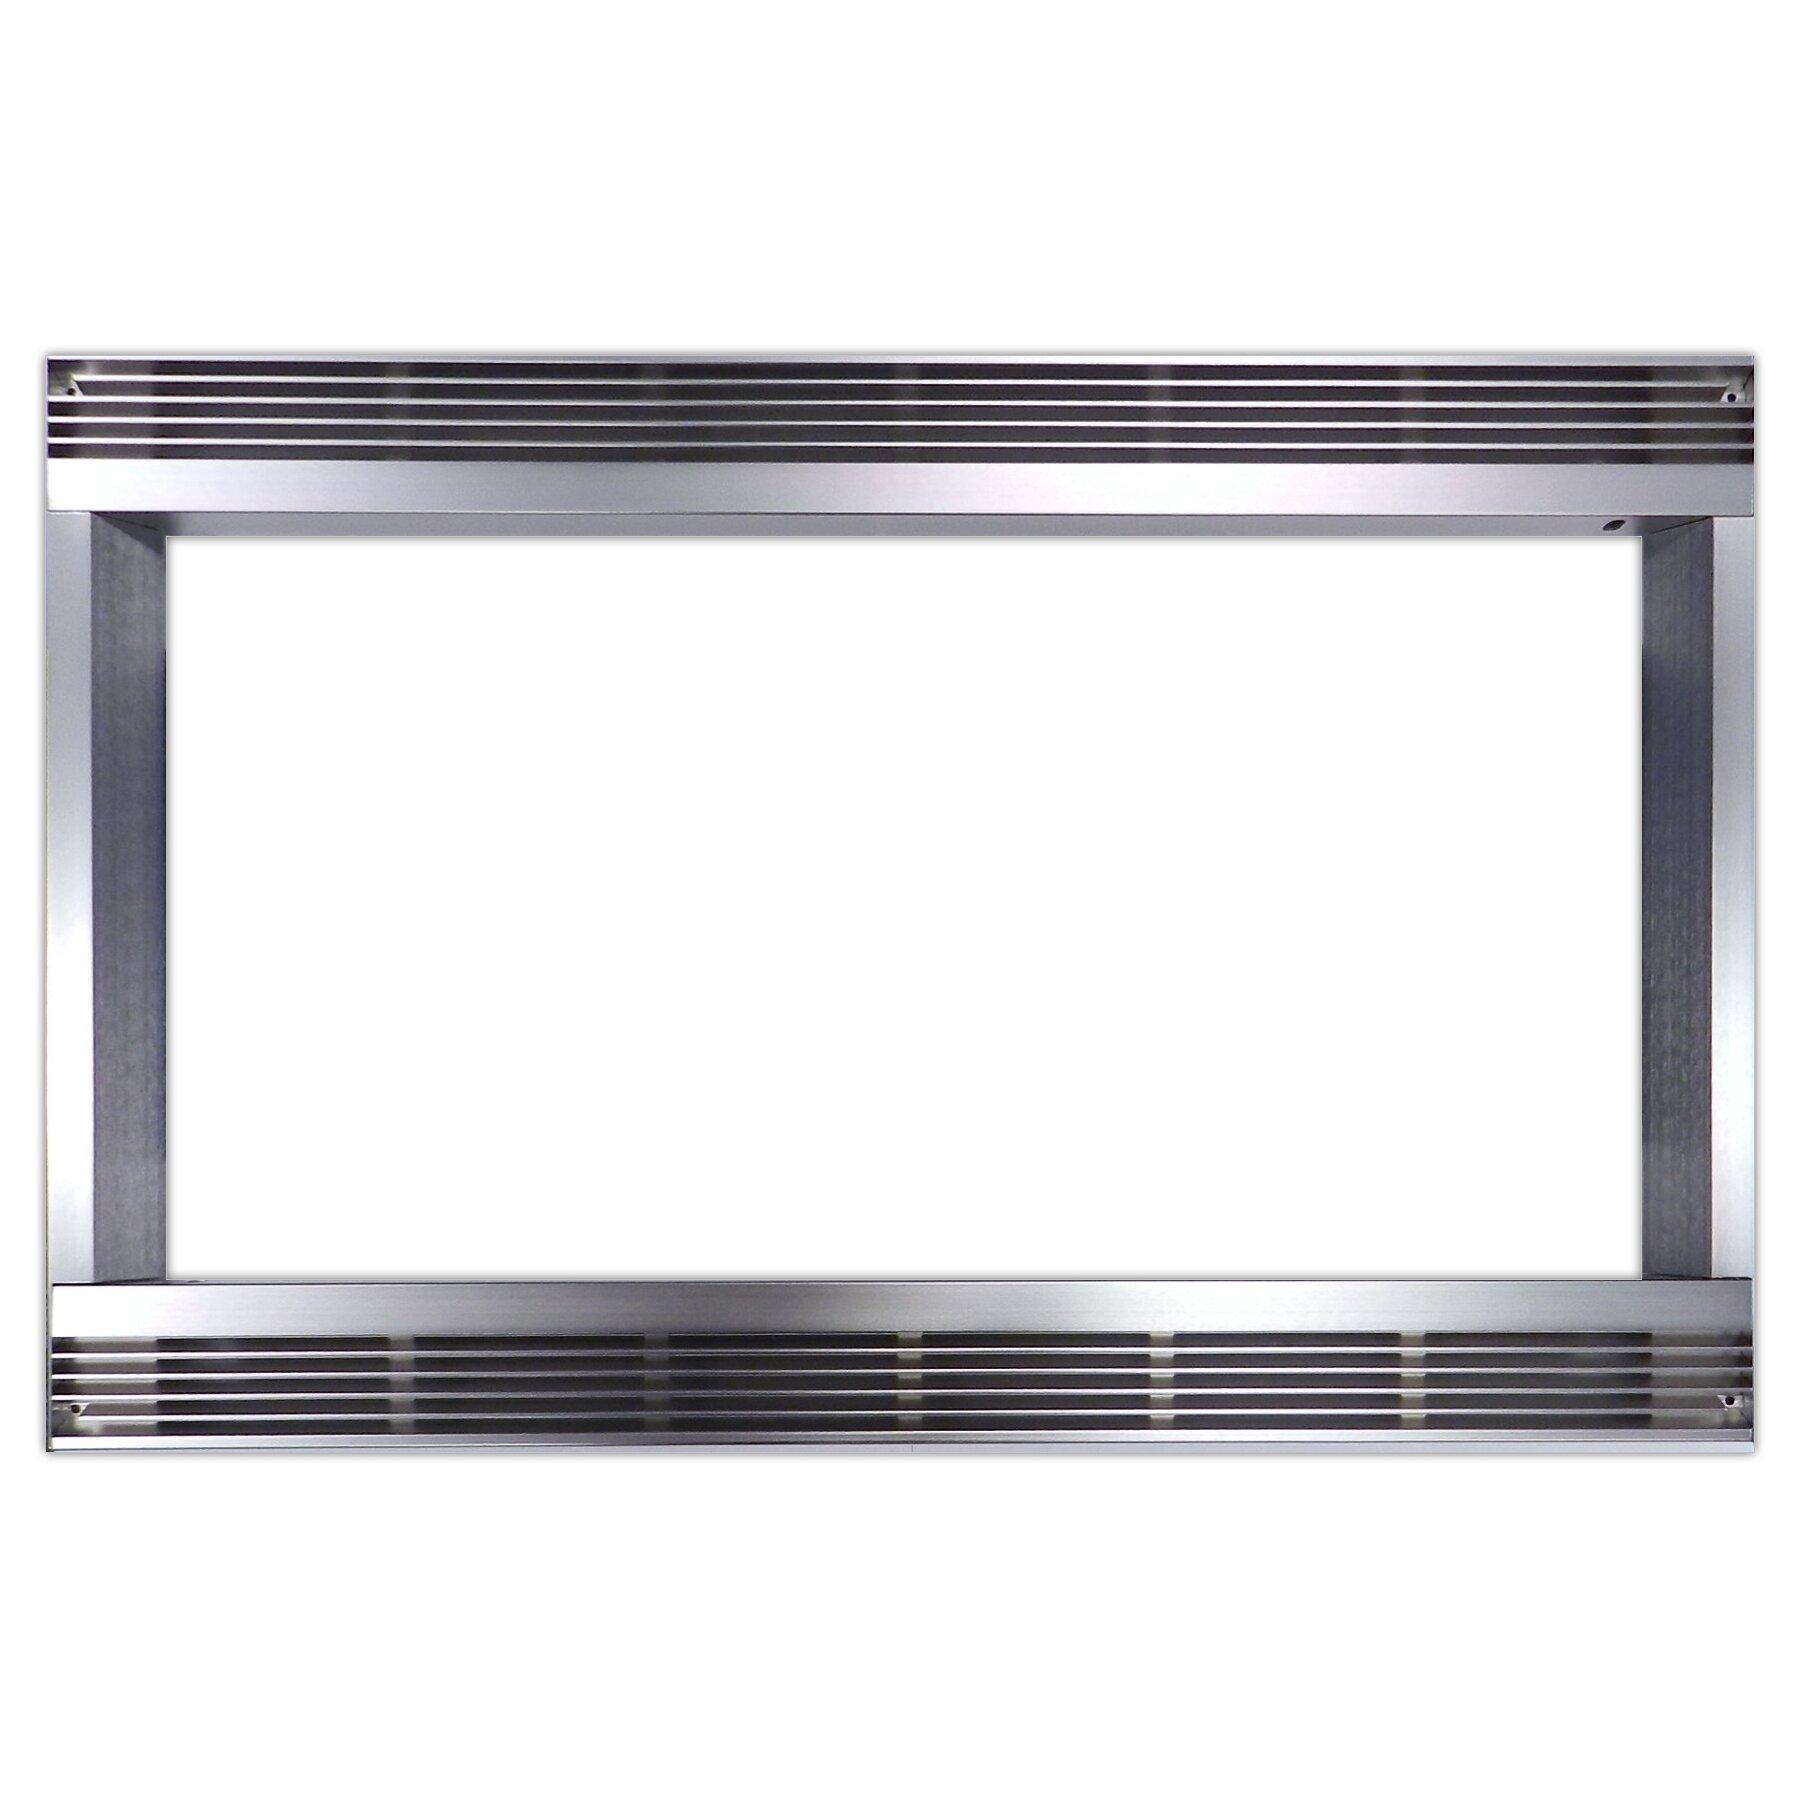 Sharp built in microwave trim kit reviews wayfair for Microwave ovens built in with trim kit